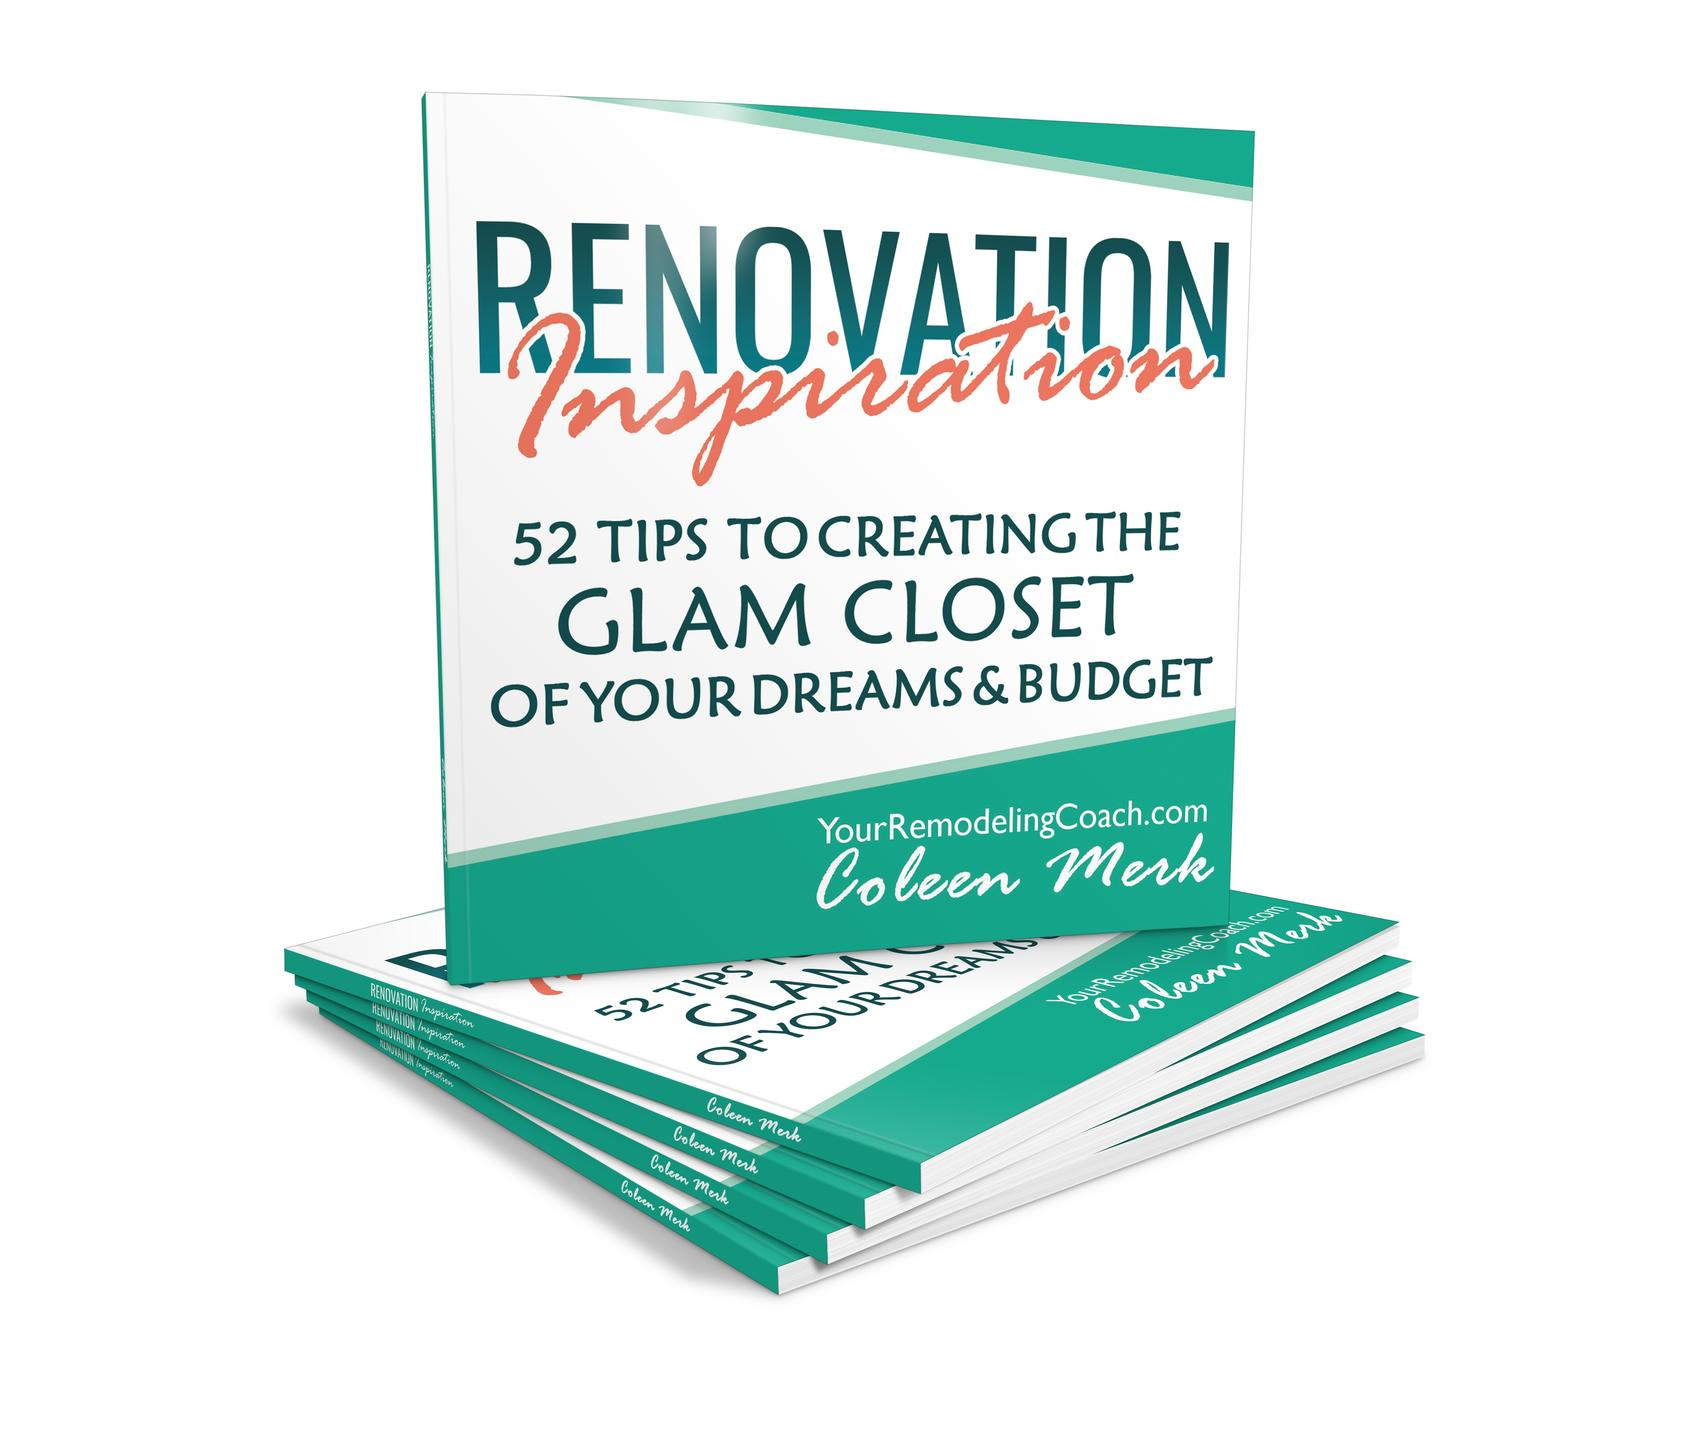 NanColeen Merk Renovation Inspiration Book1 Glam Closet Published by Soar 2 Success Publishing